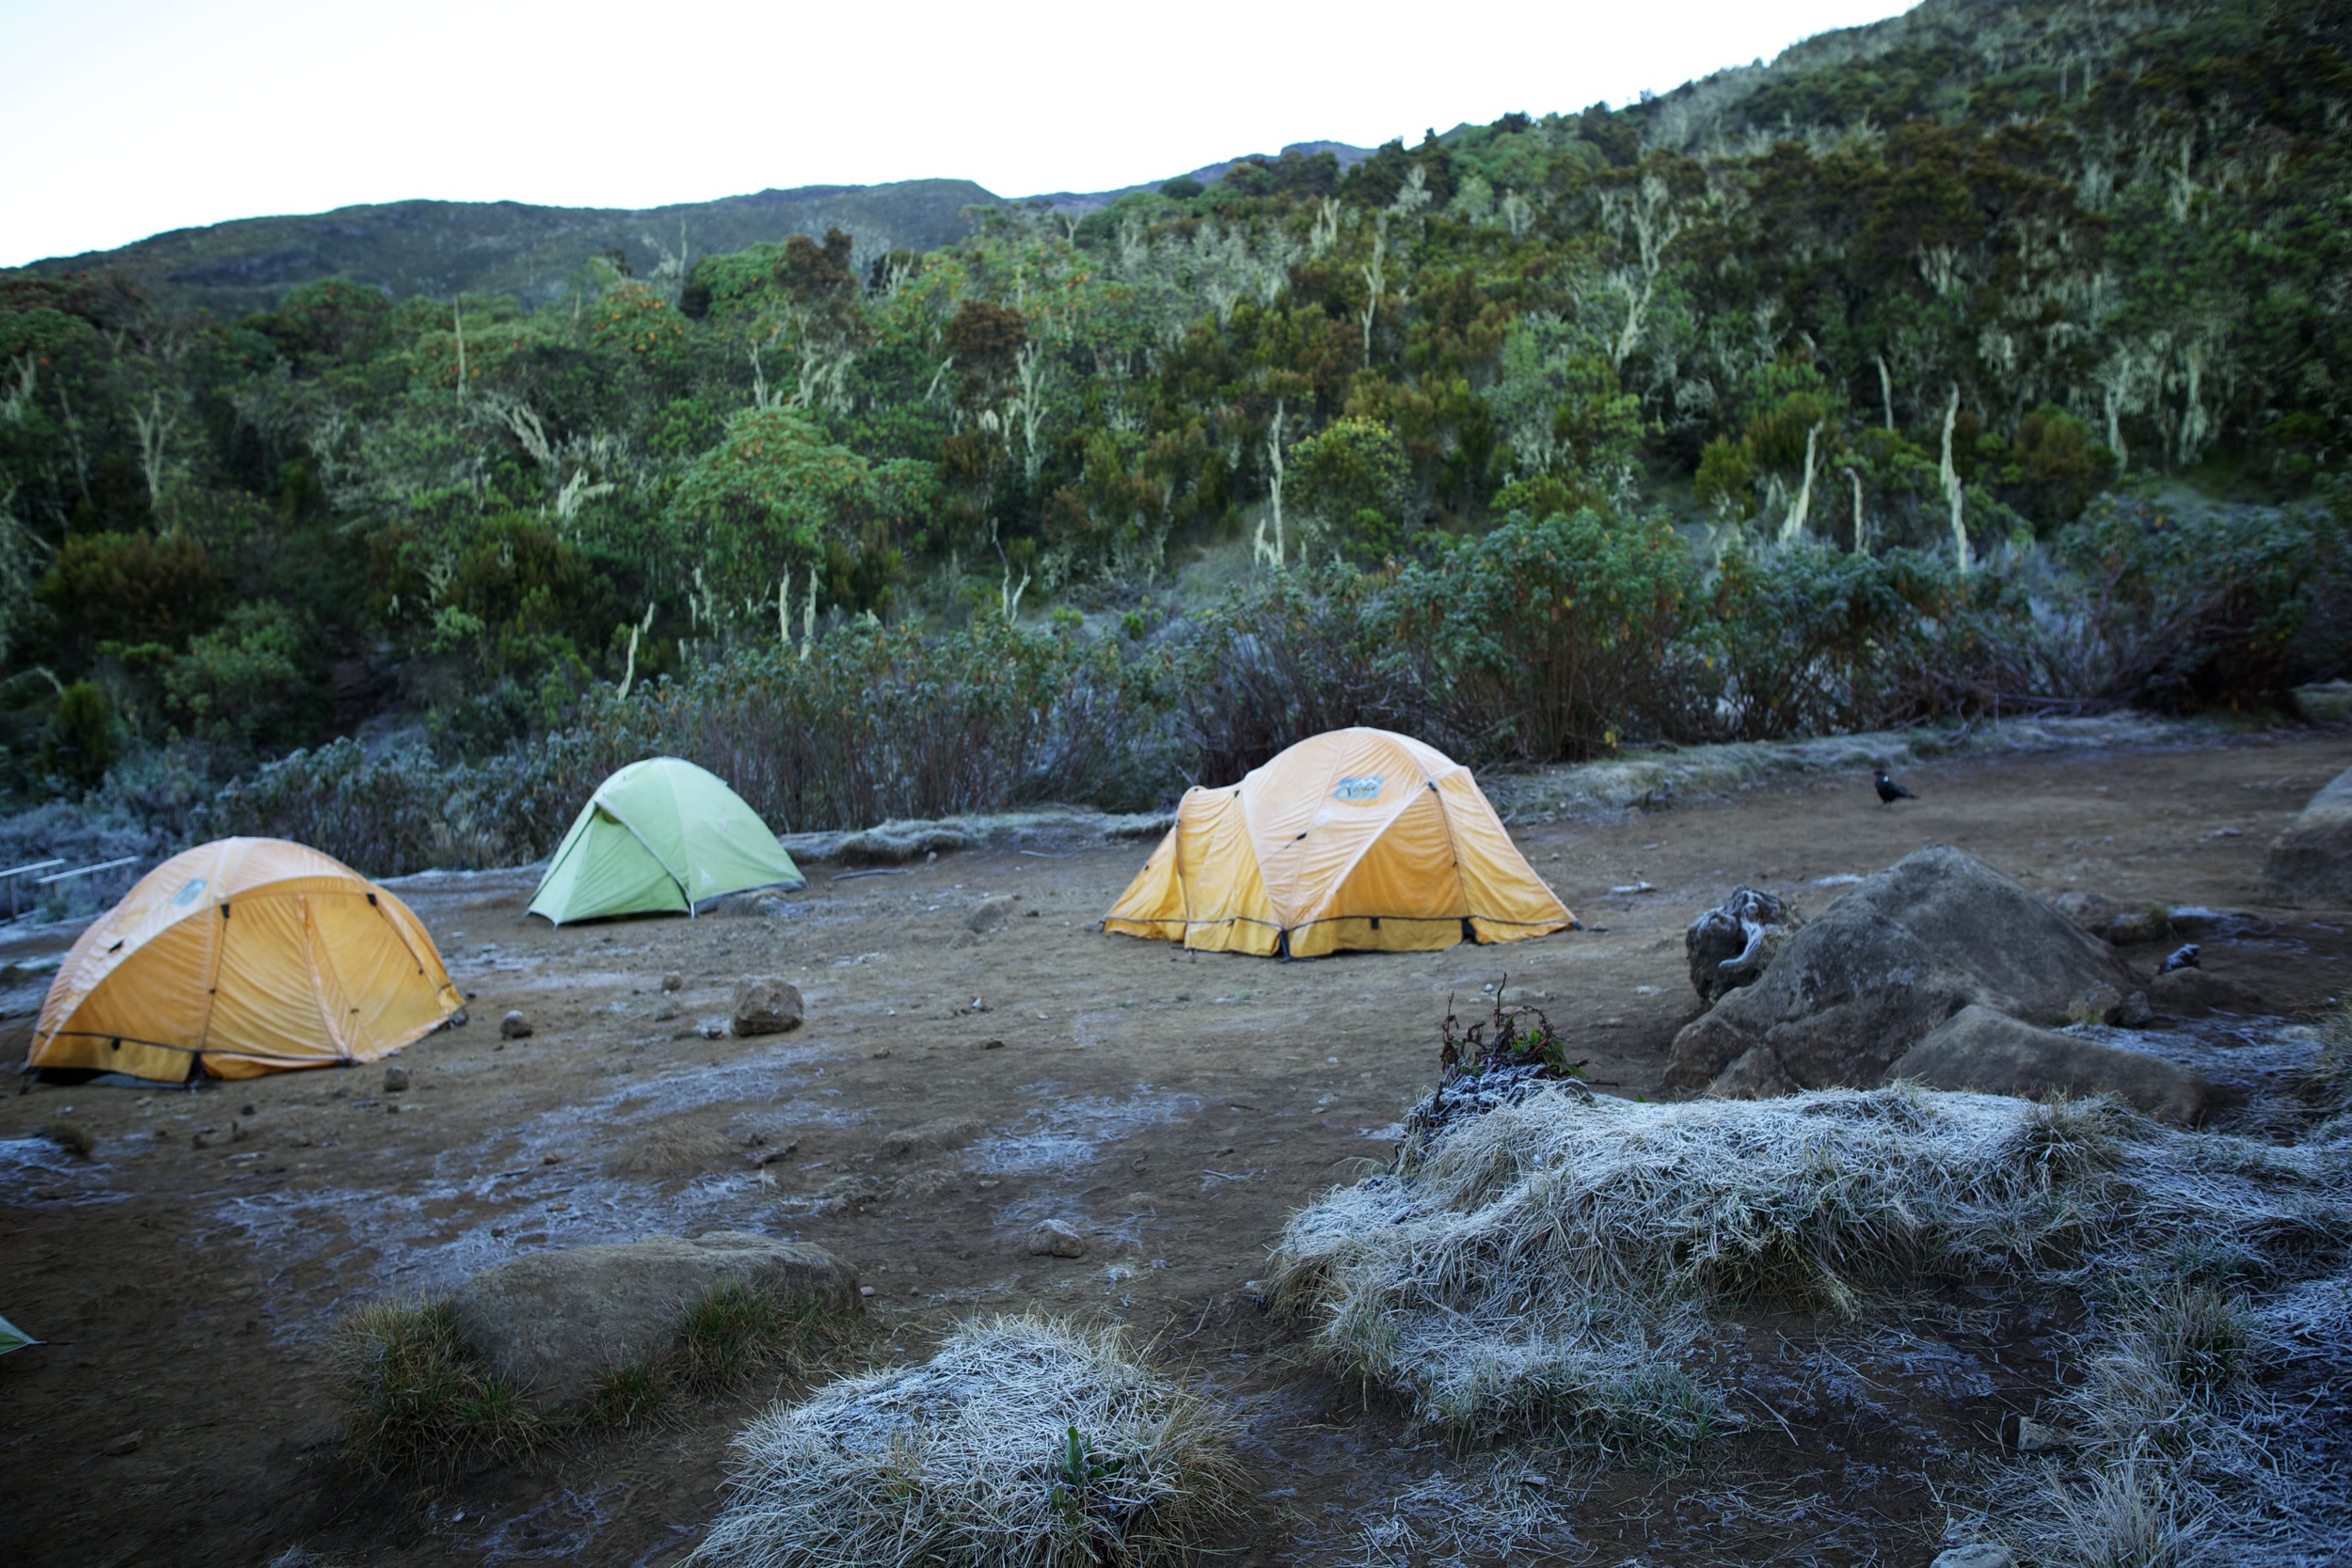 Machame Hut Camp, Kilimanjaro (TZ), Sep 2012